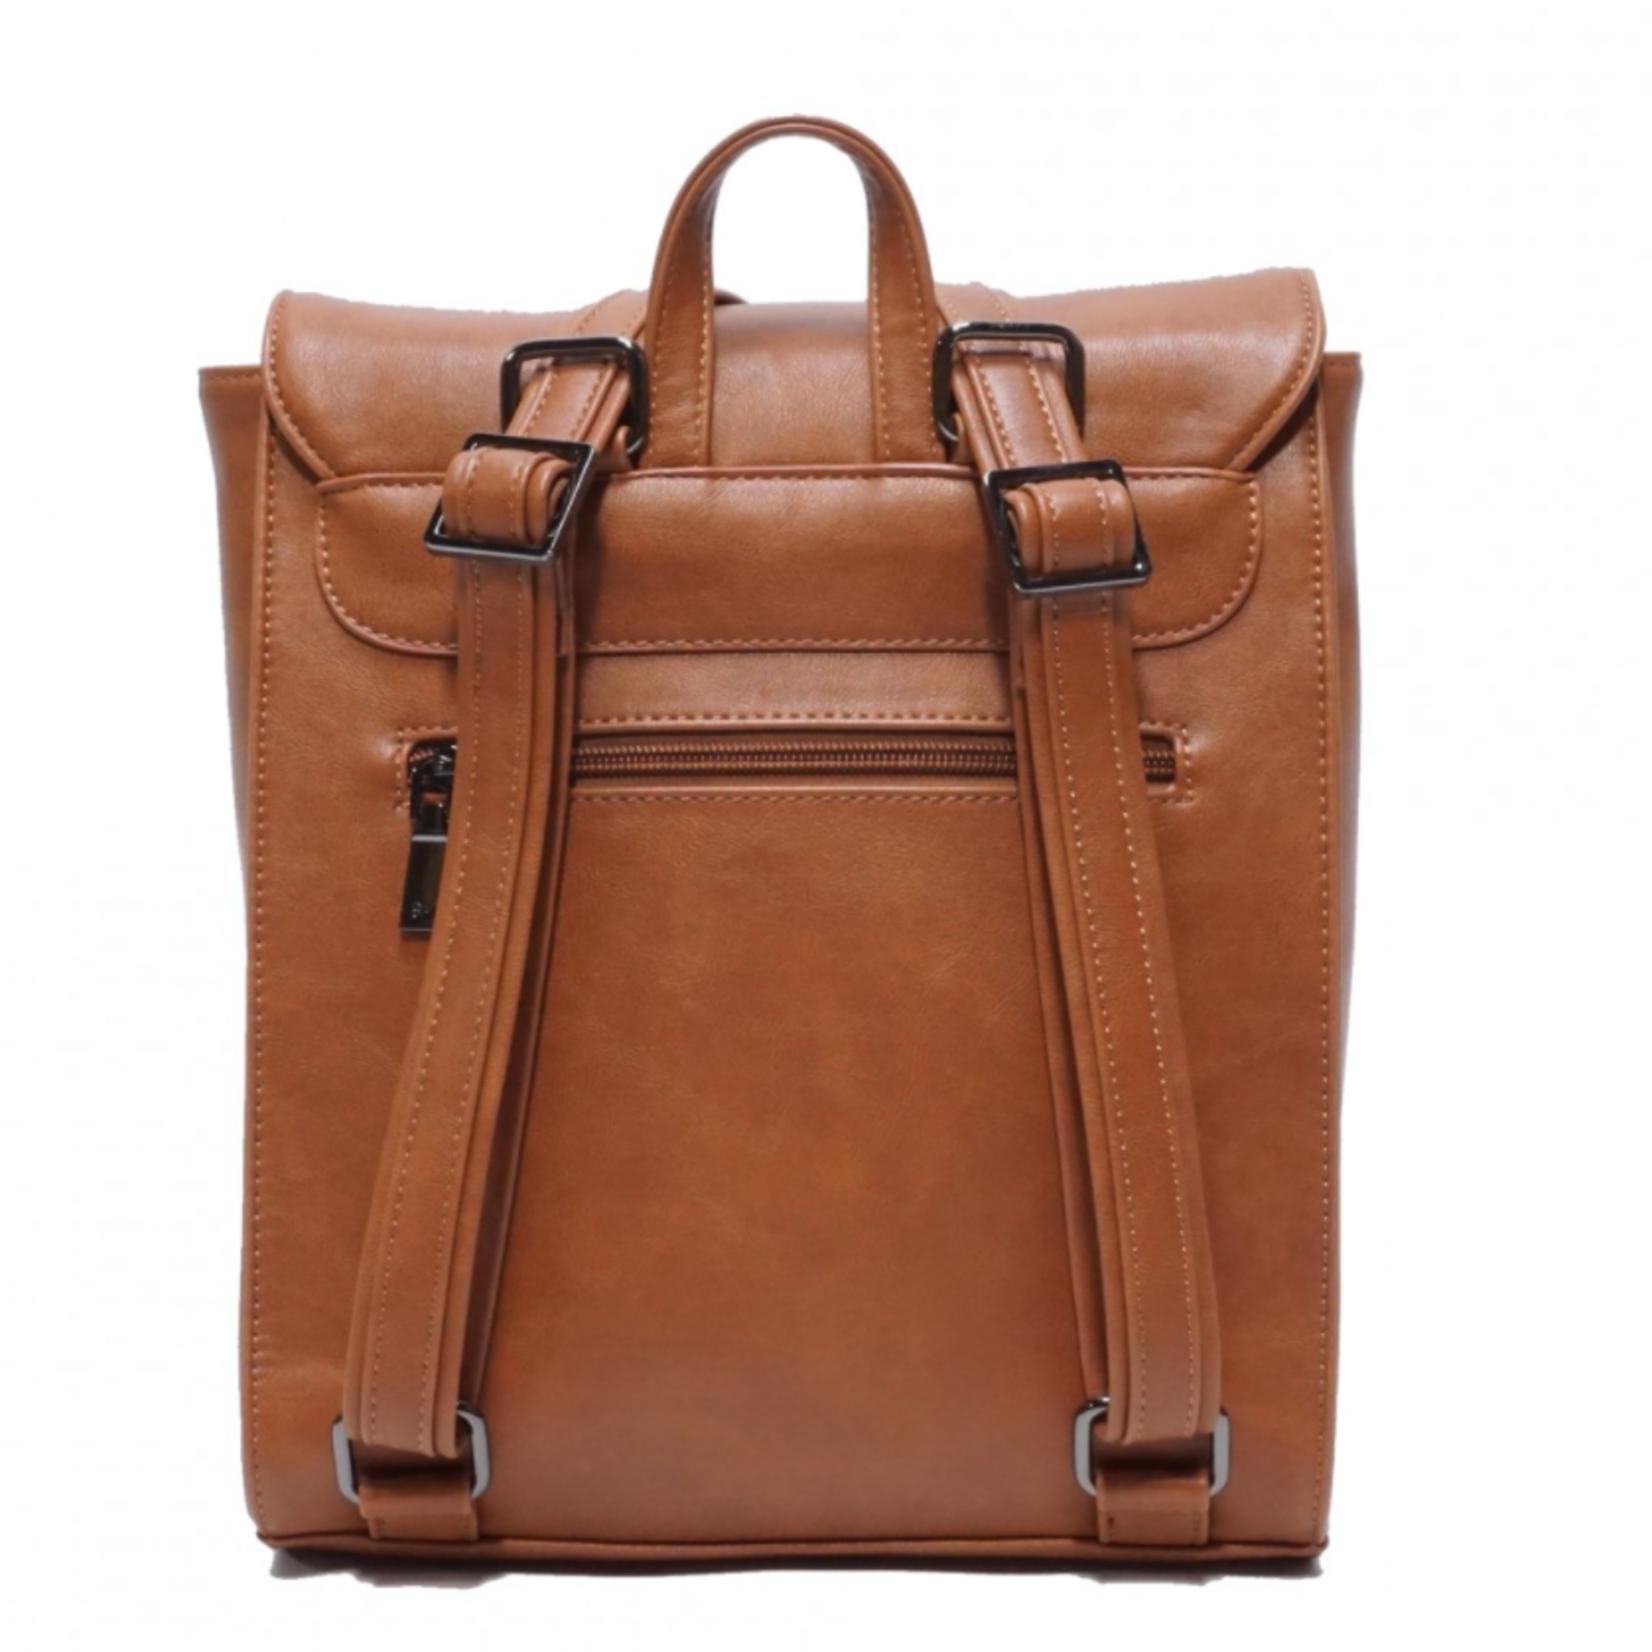 S-Q Inc. Amara Convertible Backpack